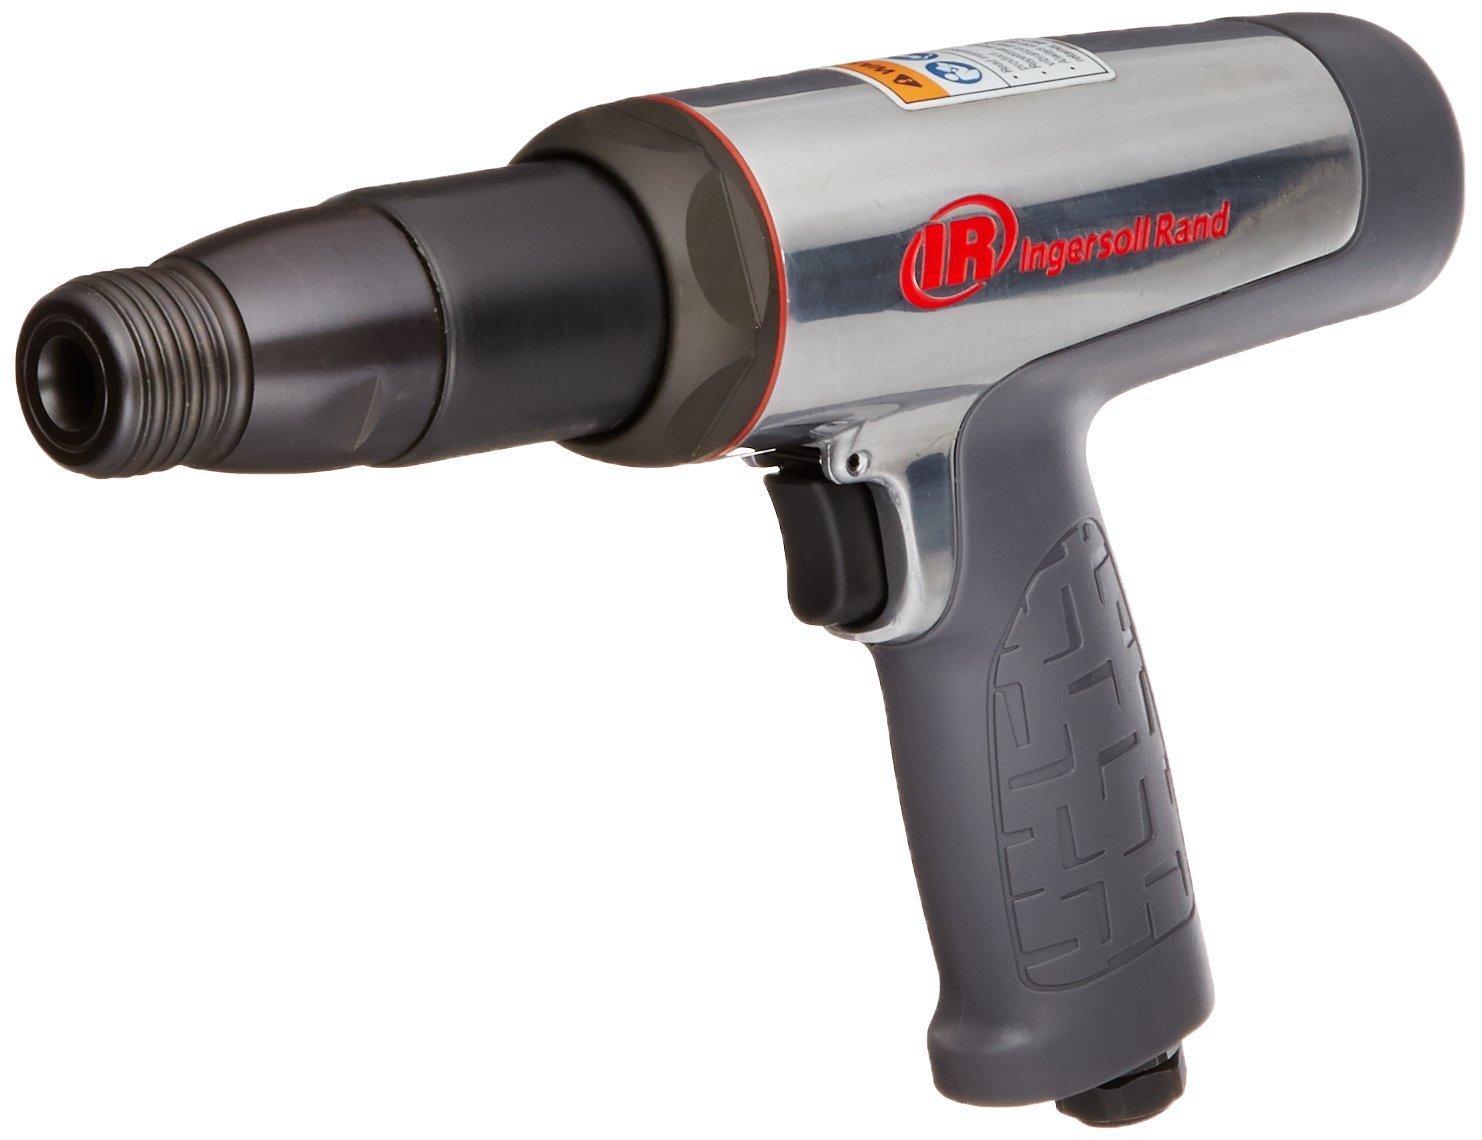 Low Vibration IRT118MAX Brand New! Long Barrel Air Hammer